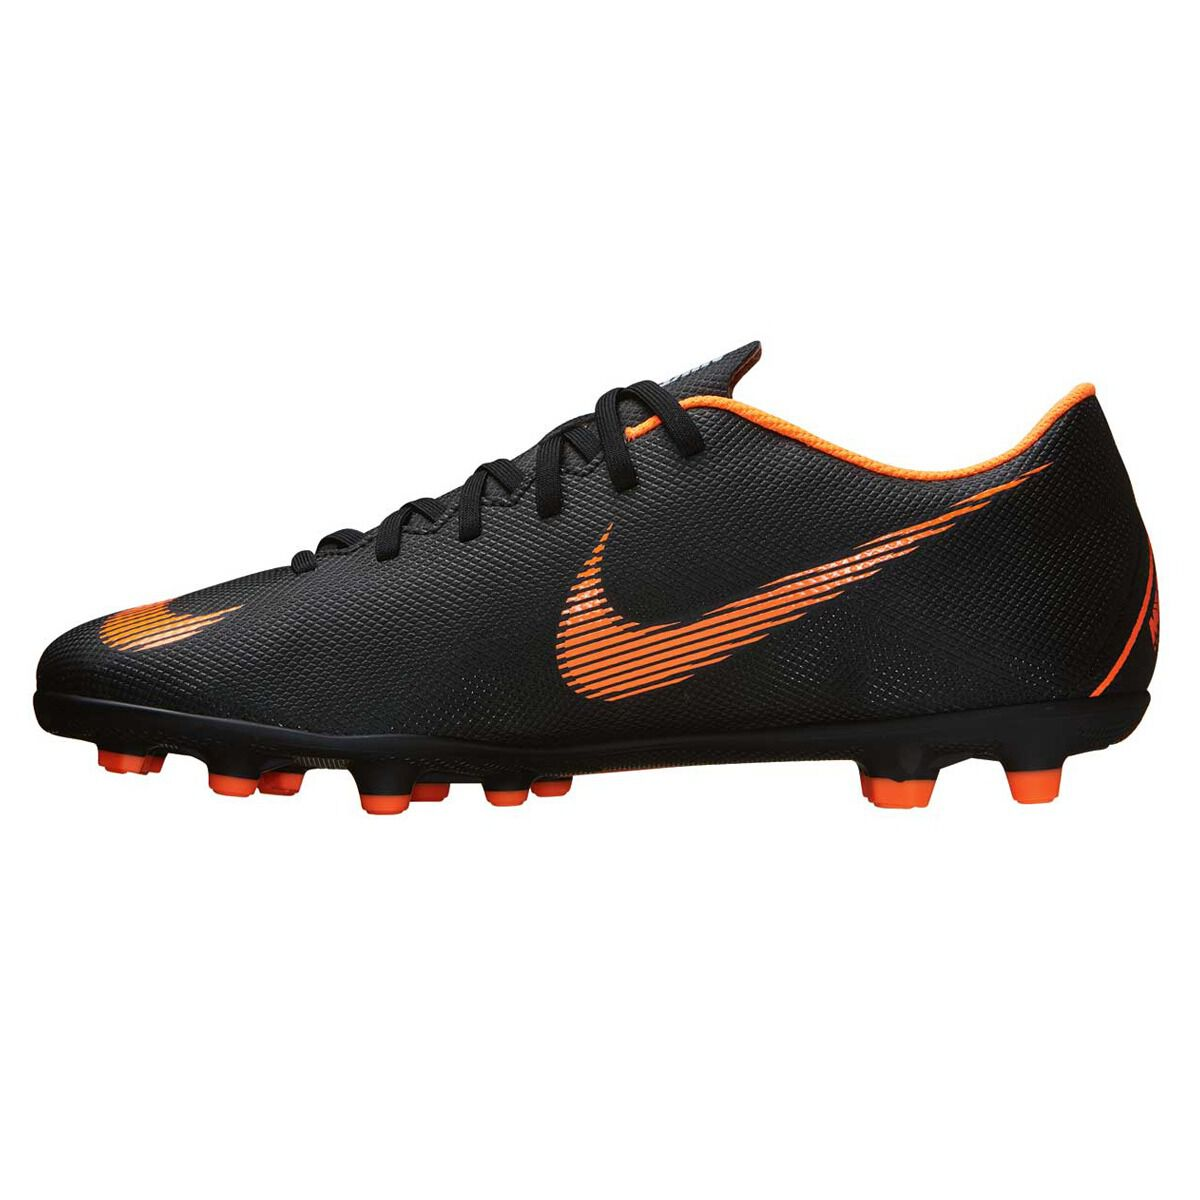 344285095 discount nike mercurial vapor 12 club mg mens football boots black orange  us 7 adult 646ef